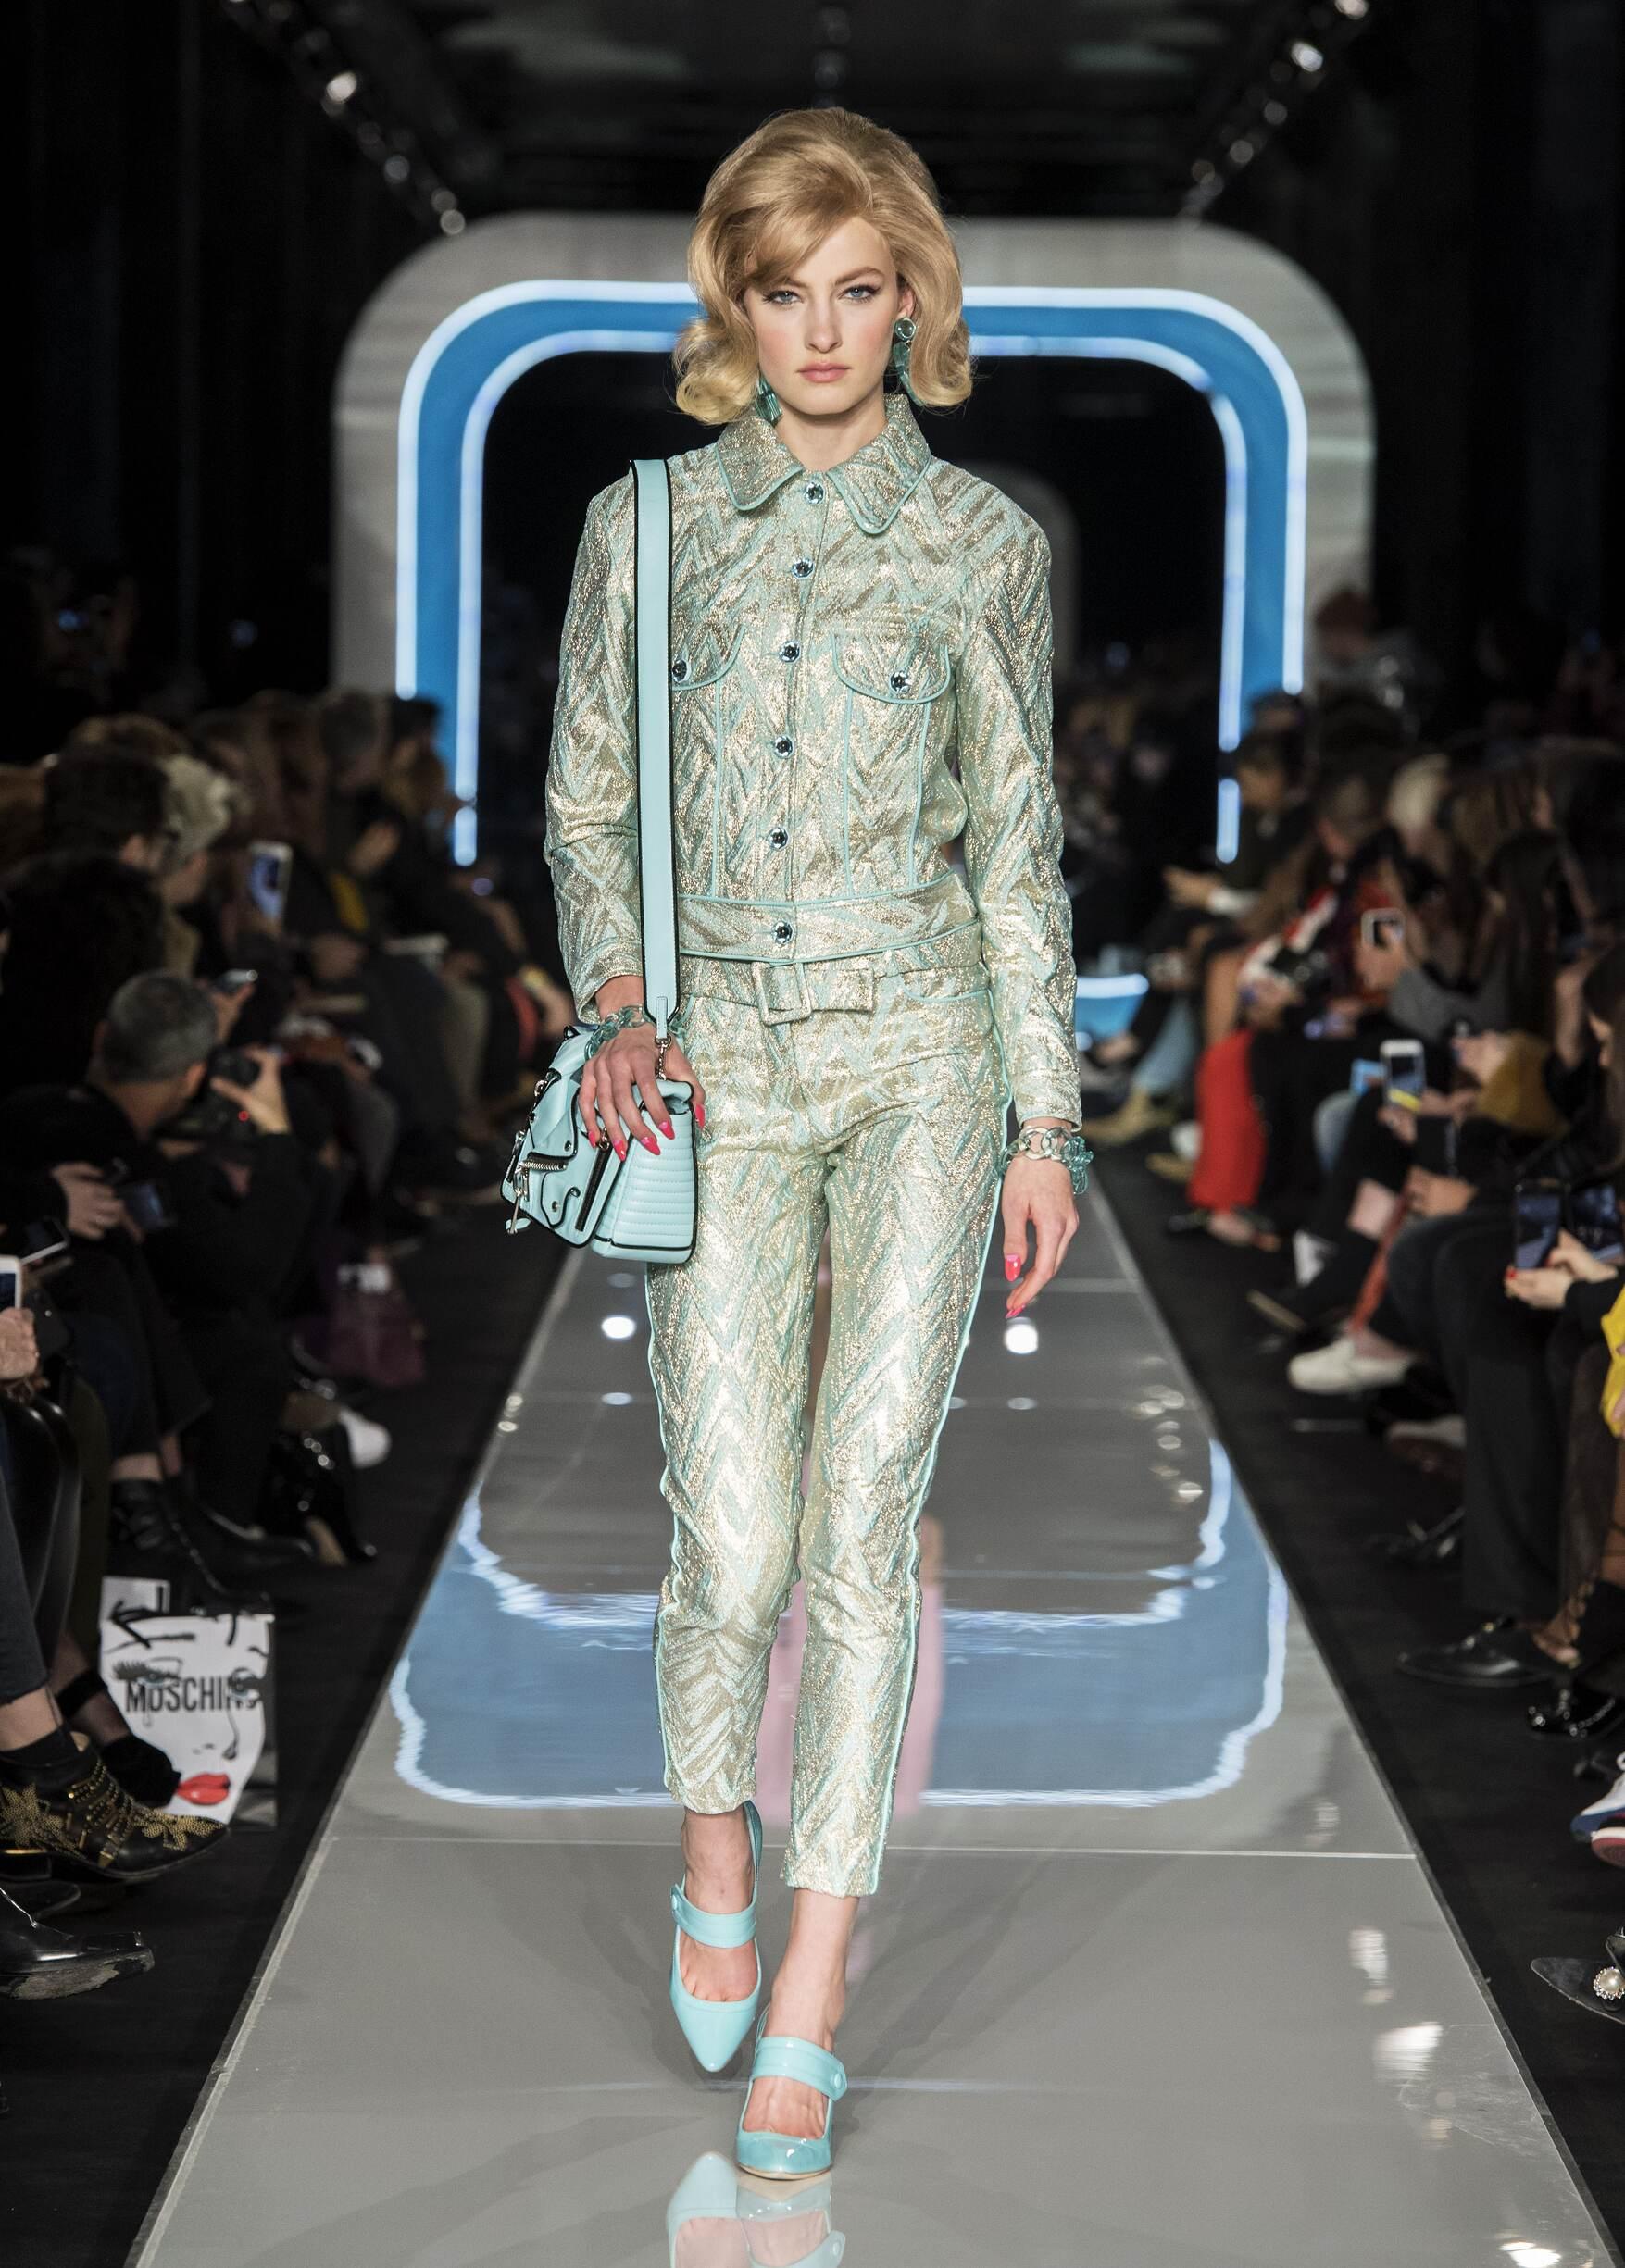 2018 Catwalk Moschino Woman Fashion Show Winter